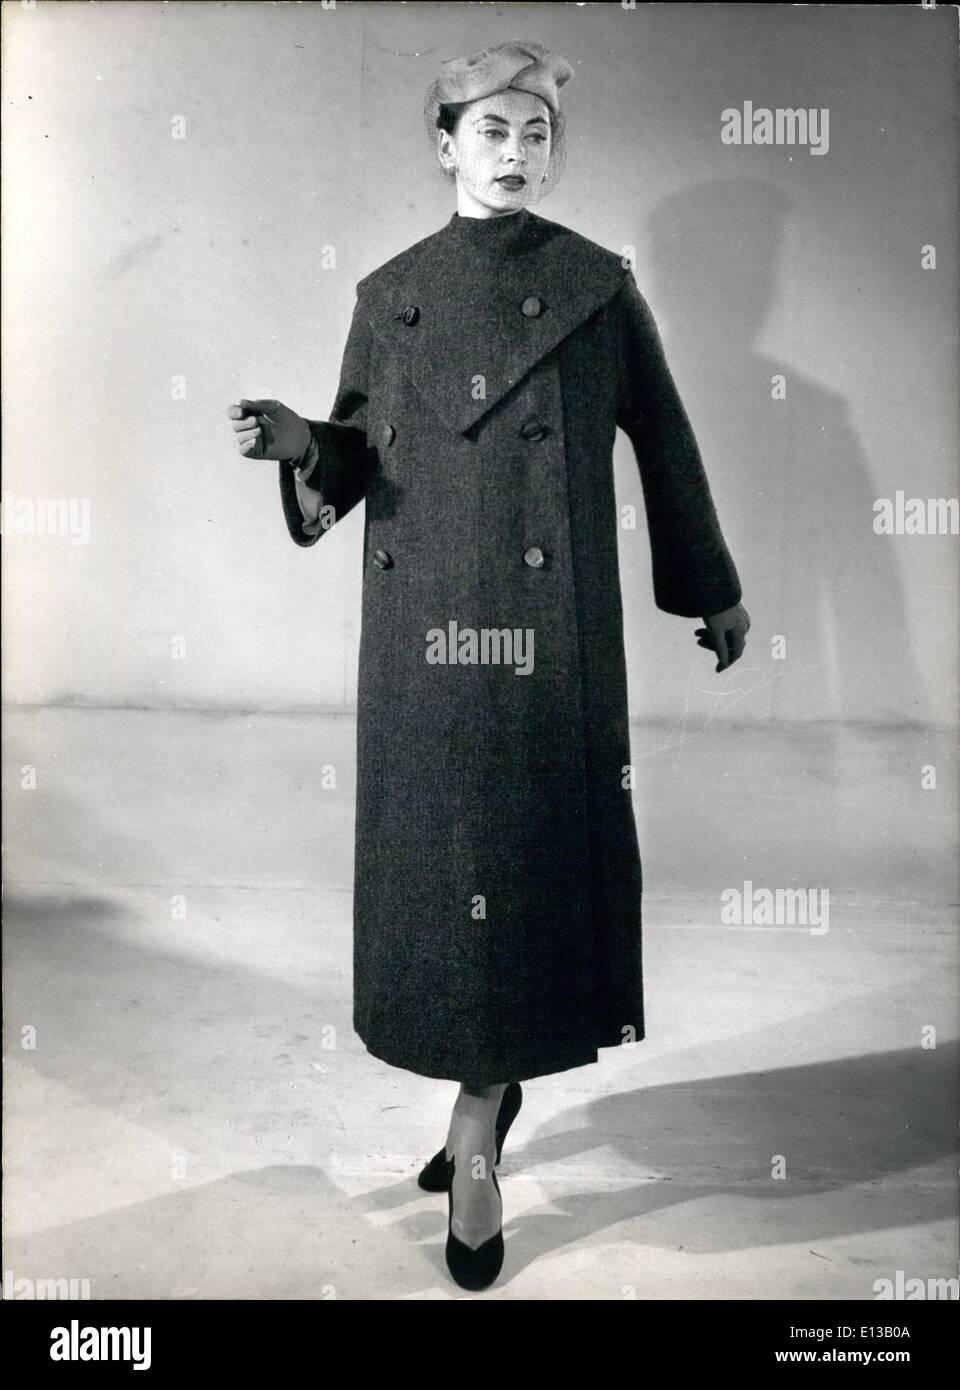 Feb. 29, 2012 - Parisian Fashions for Autumn - Winter 1953 - 1954 ''Bistrat'' coat in dark green shetland with buttoned Plastroni. - Stock Image